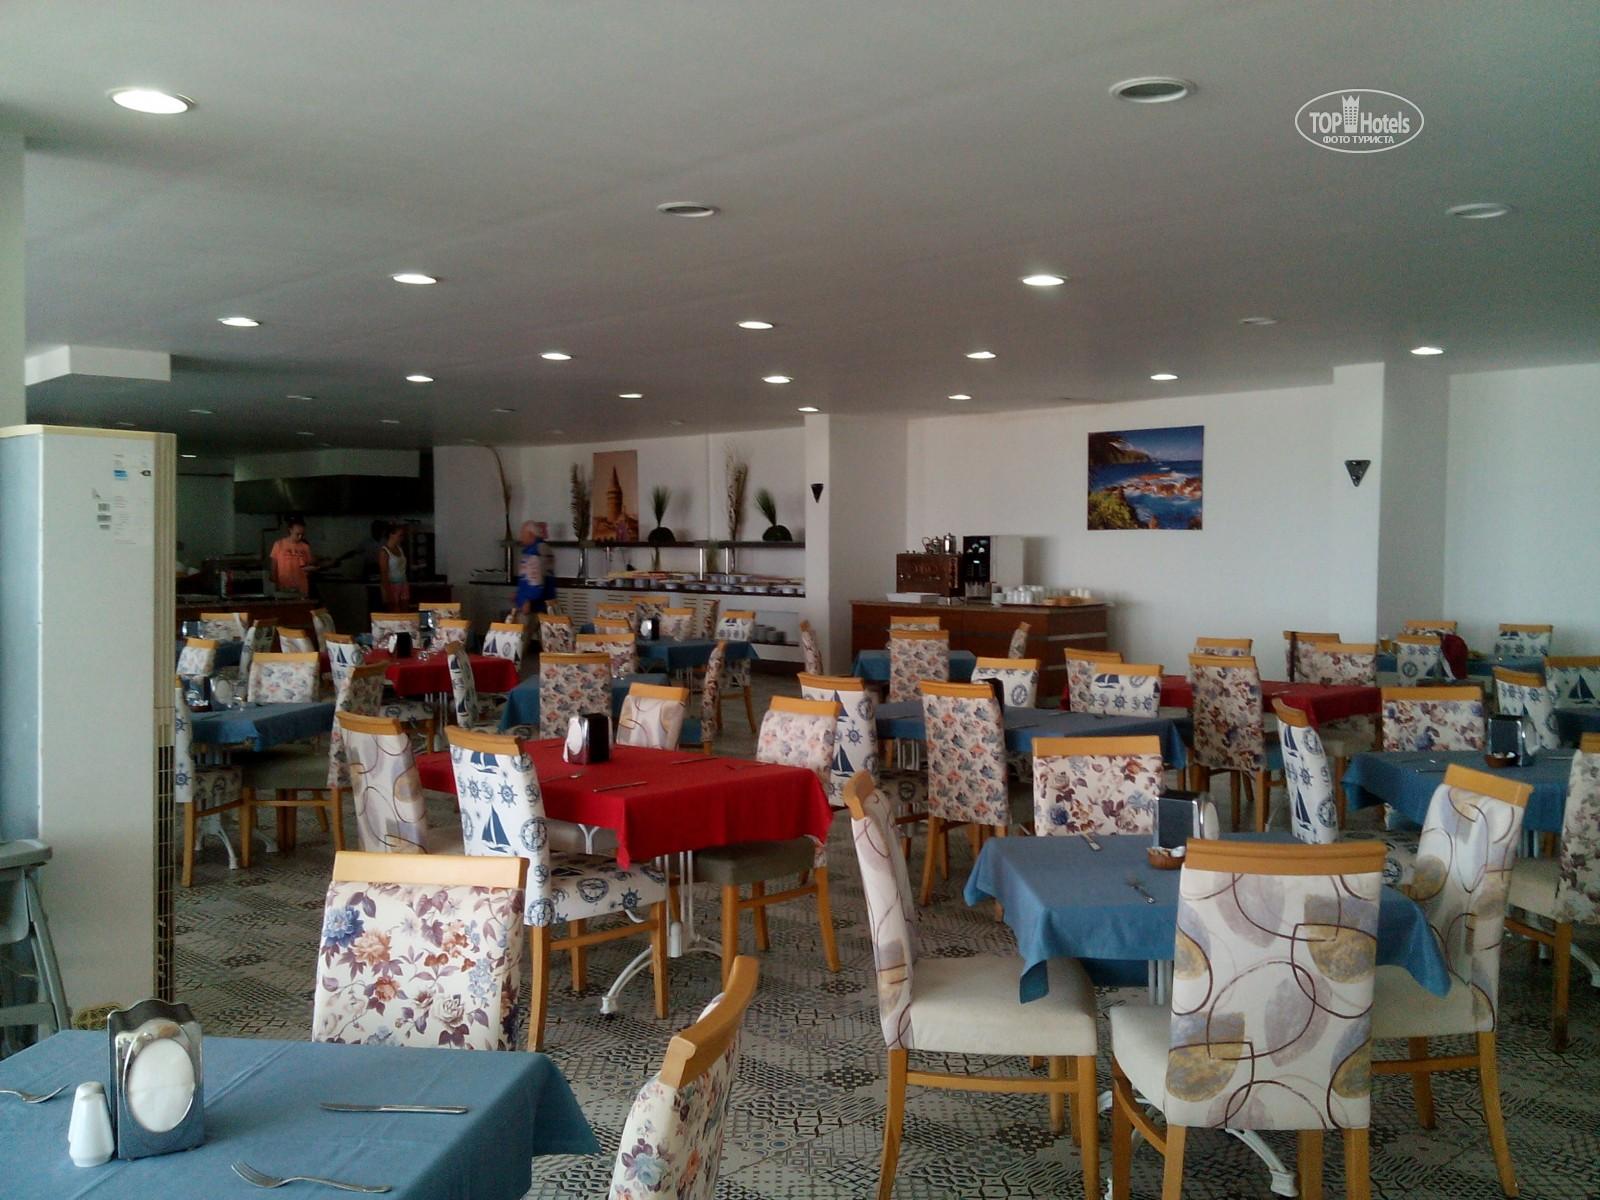 Iso & Asi Hotel Turkler, Туреччина, Аланья, тури, фото та відгуки